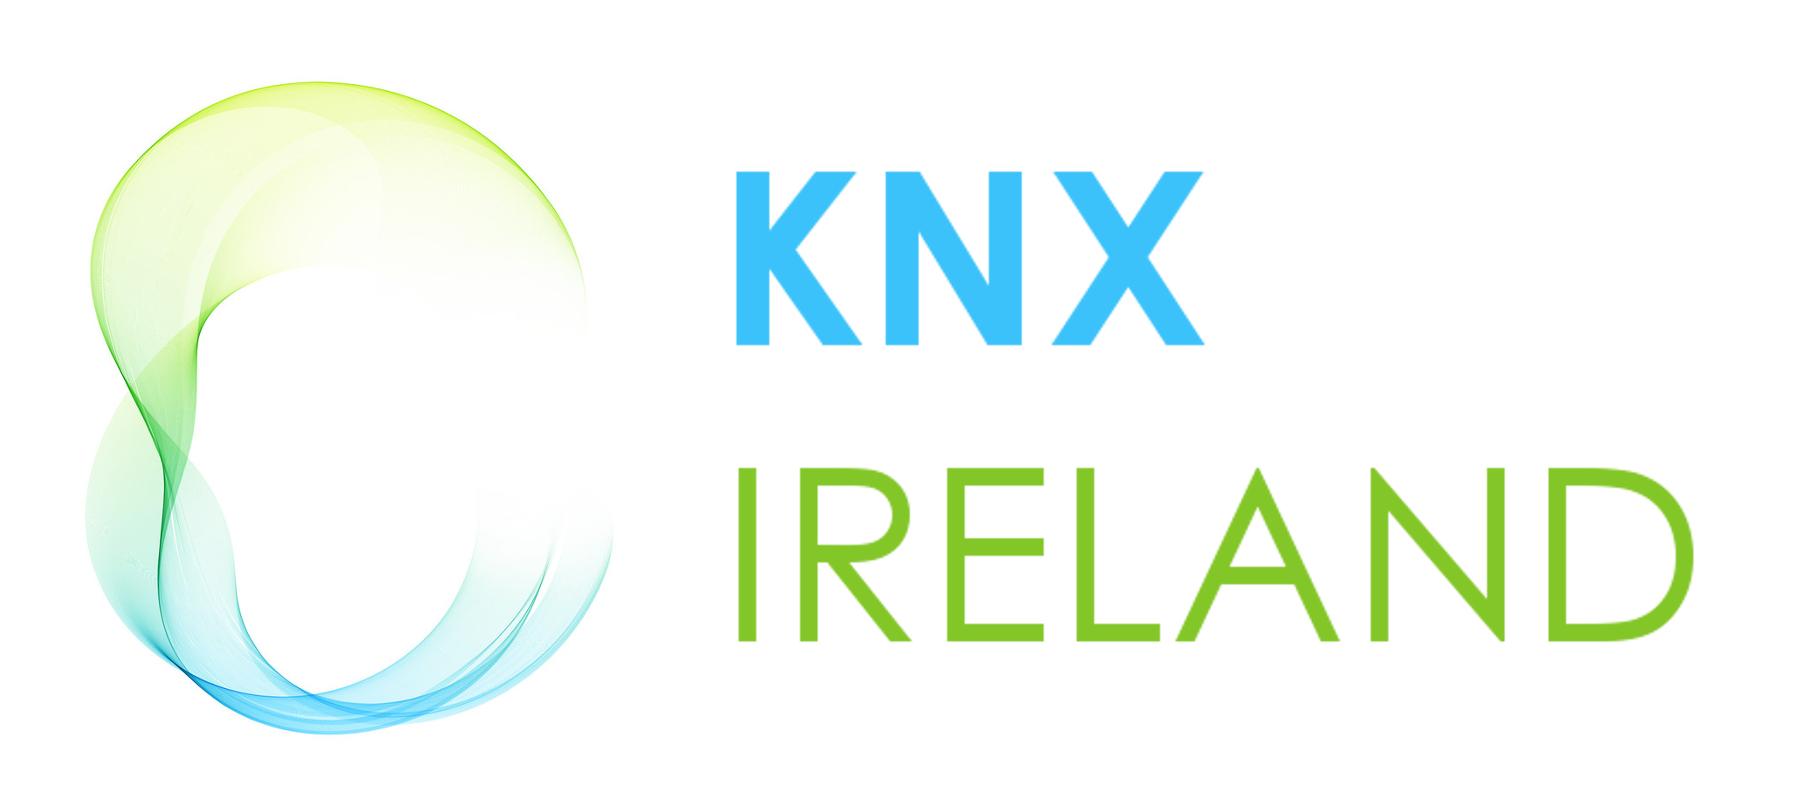 KNX Ireland